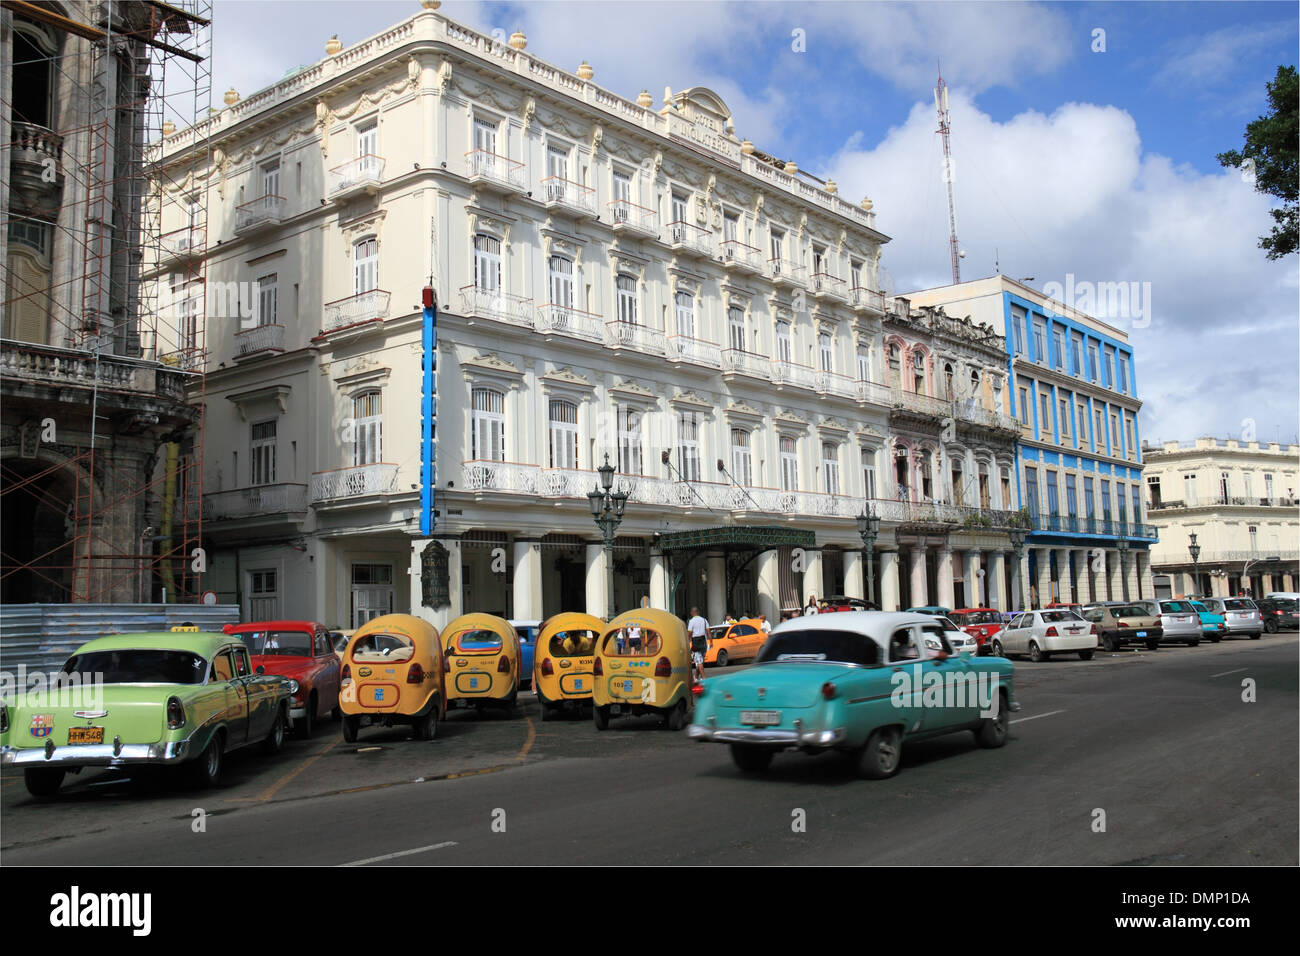 Hotel Inglaterra, Paseo de Martí (aka Paseo del Prado), Old Havana (La Habana Vieja), Cuba, Caribbean Sea, Central America - Stock Image